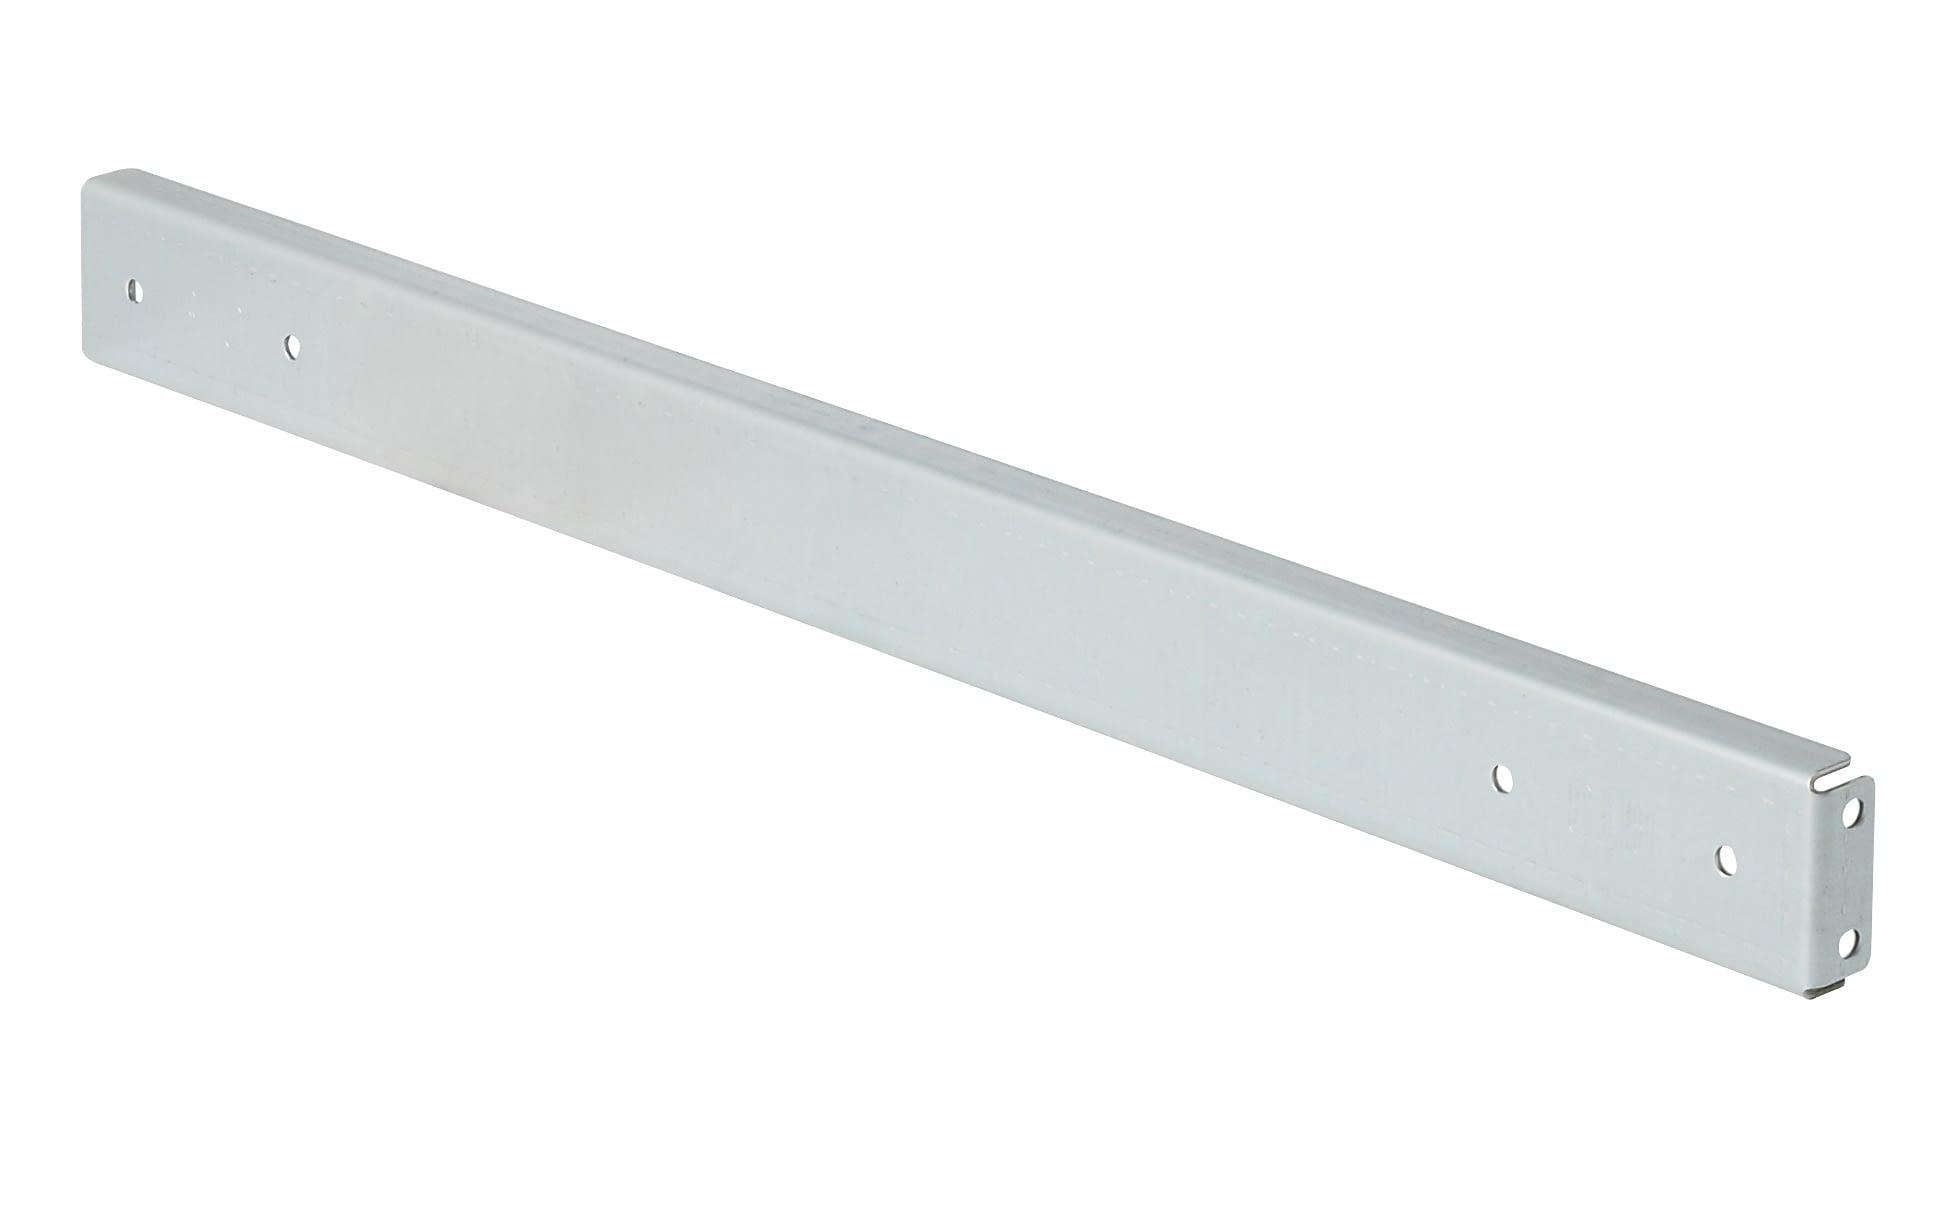 Horizontalverbinder, verzinkt, 20-11991